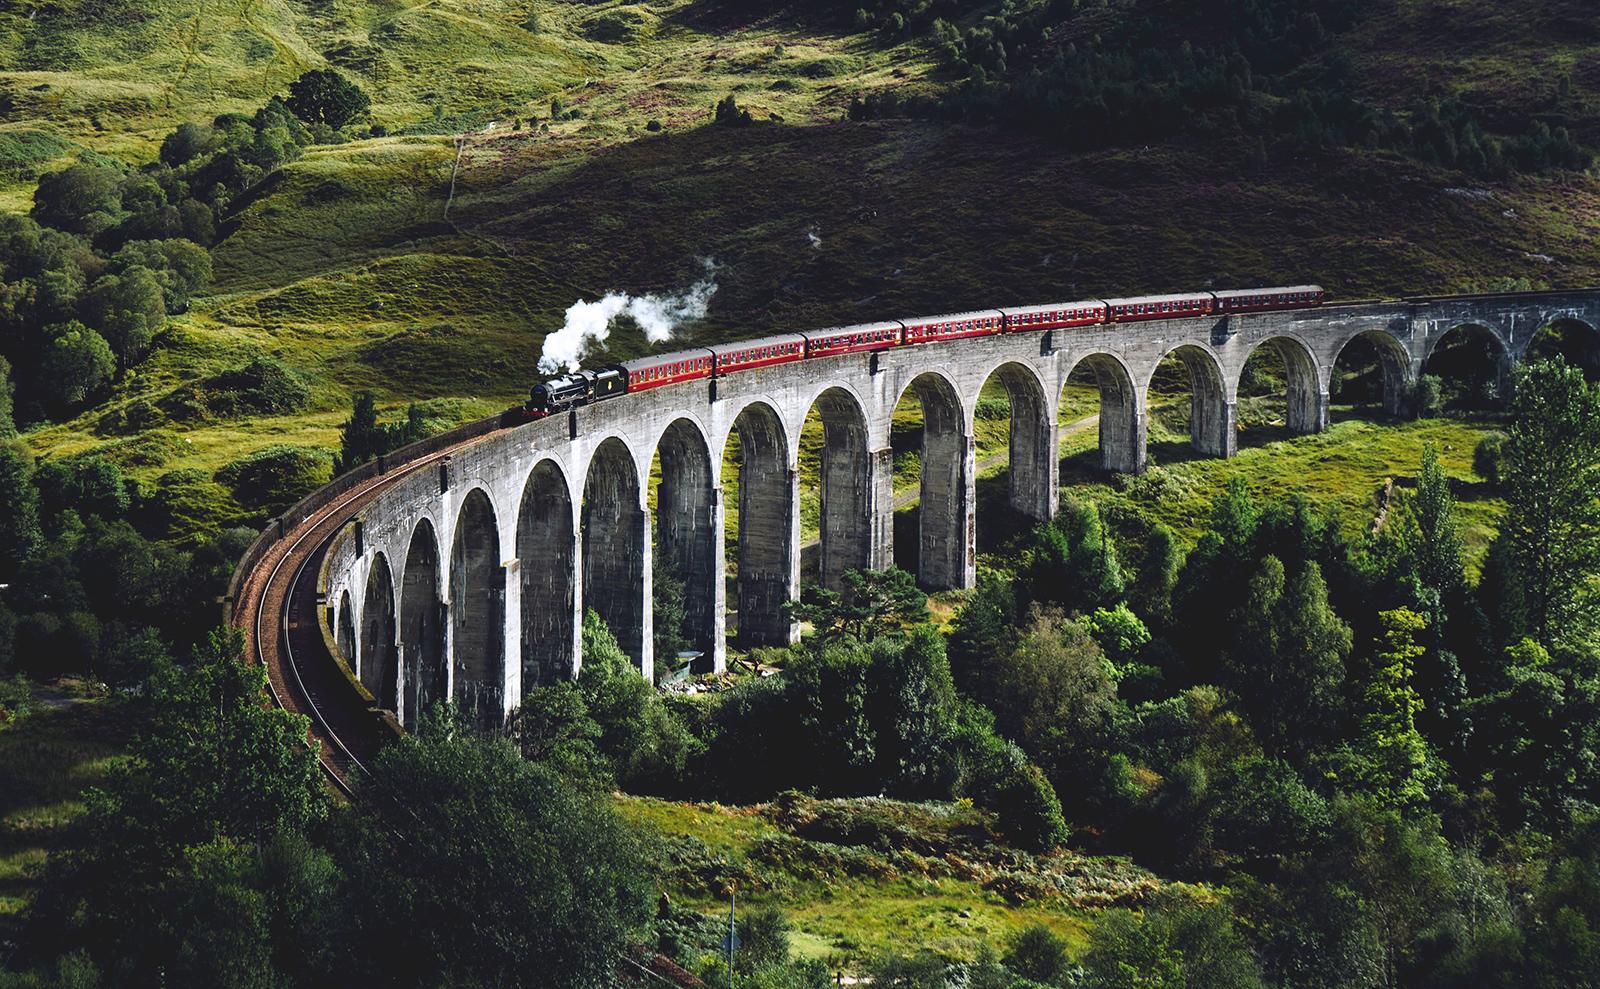 Train Travel, Books as Rihanna, Czech Melancholy & More: Endnotes 18 October